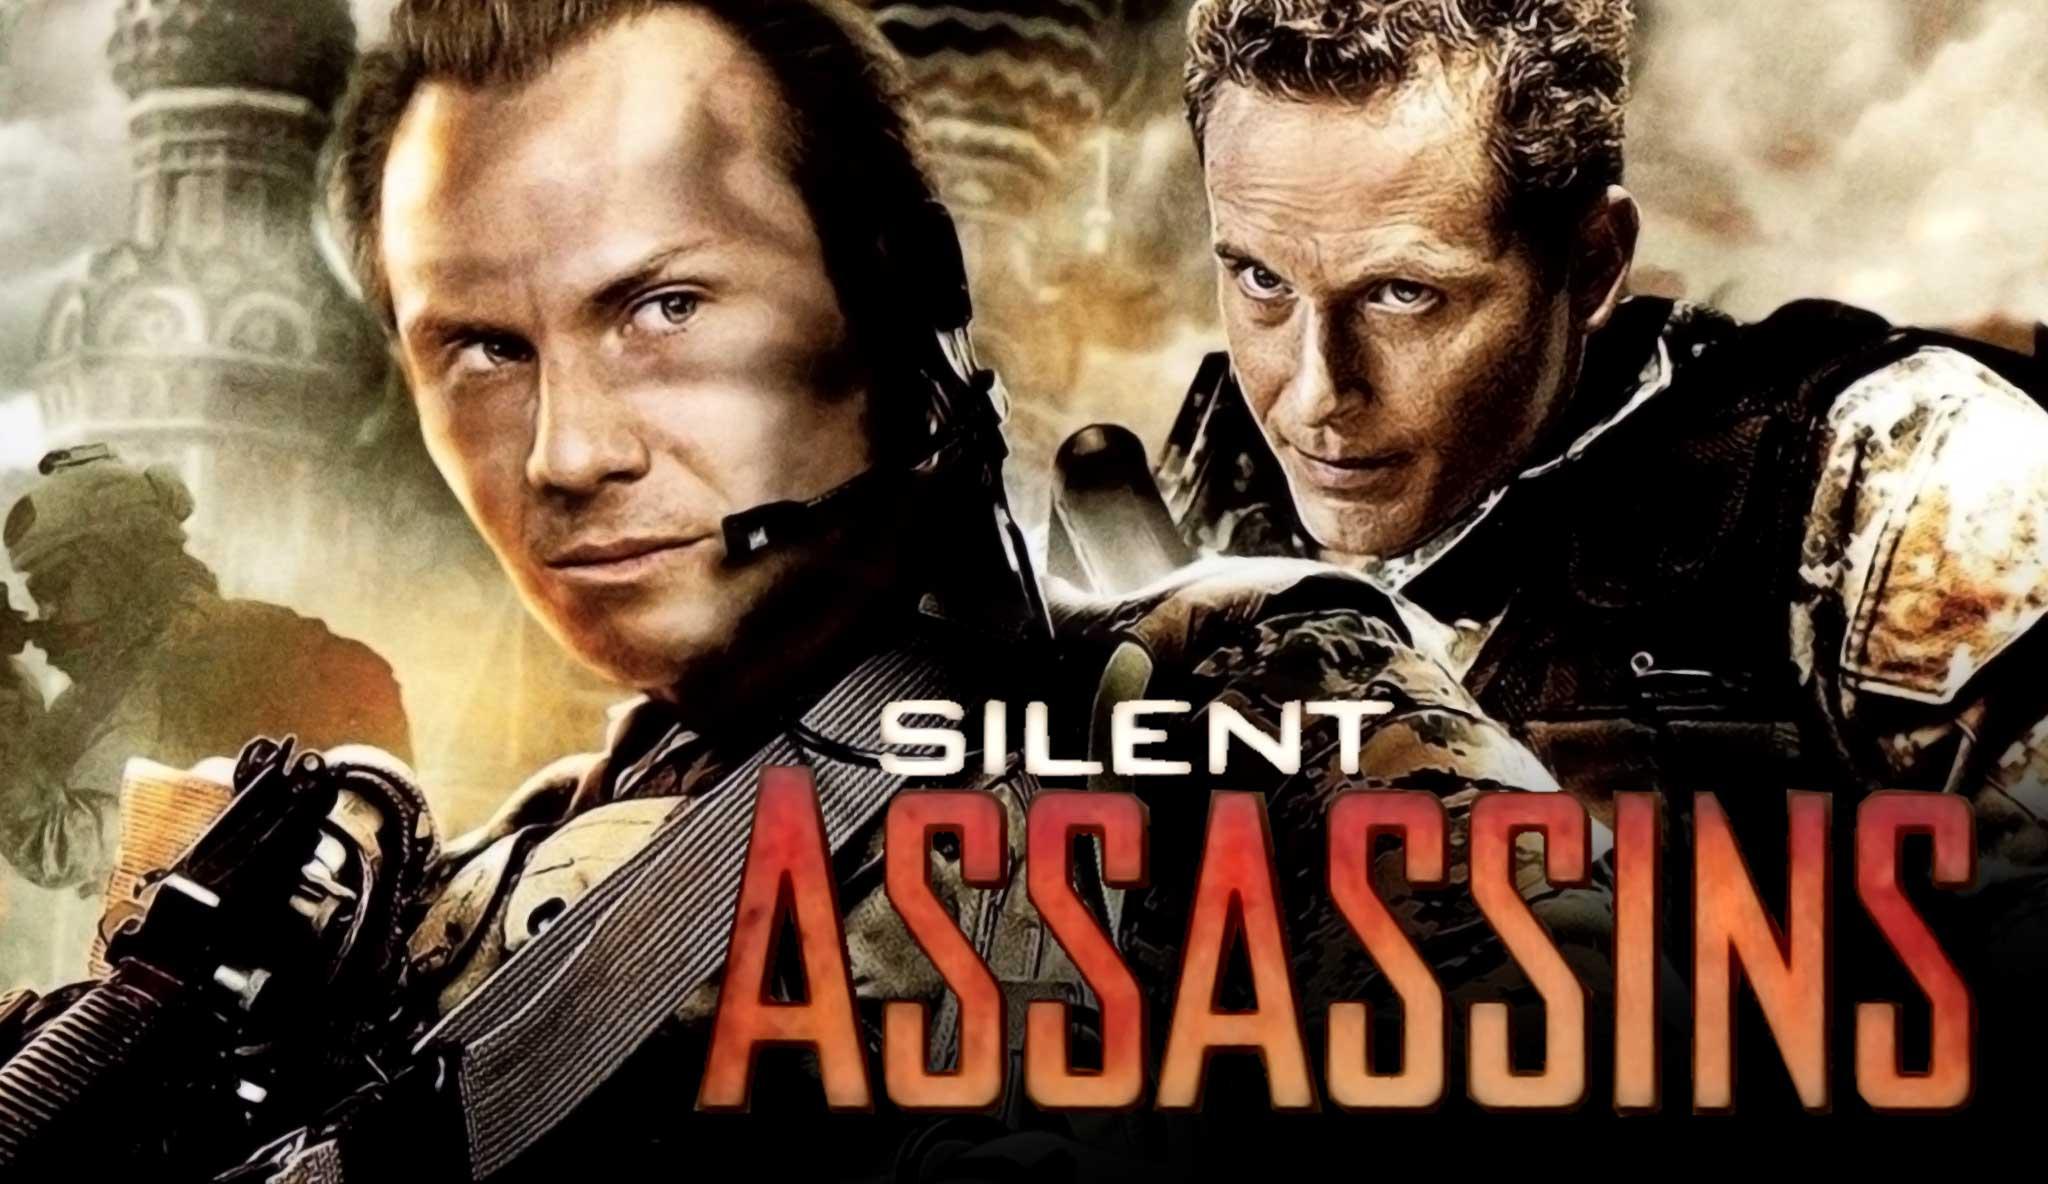 silent-assassins-lautlose-killer\header.jpg